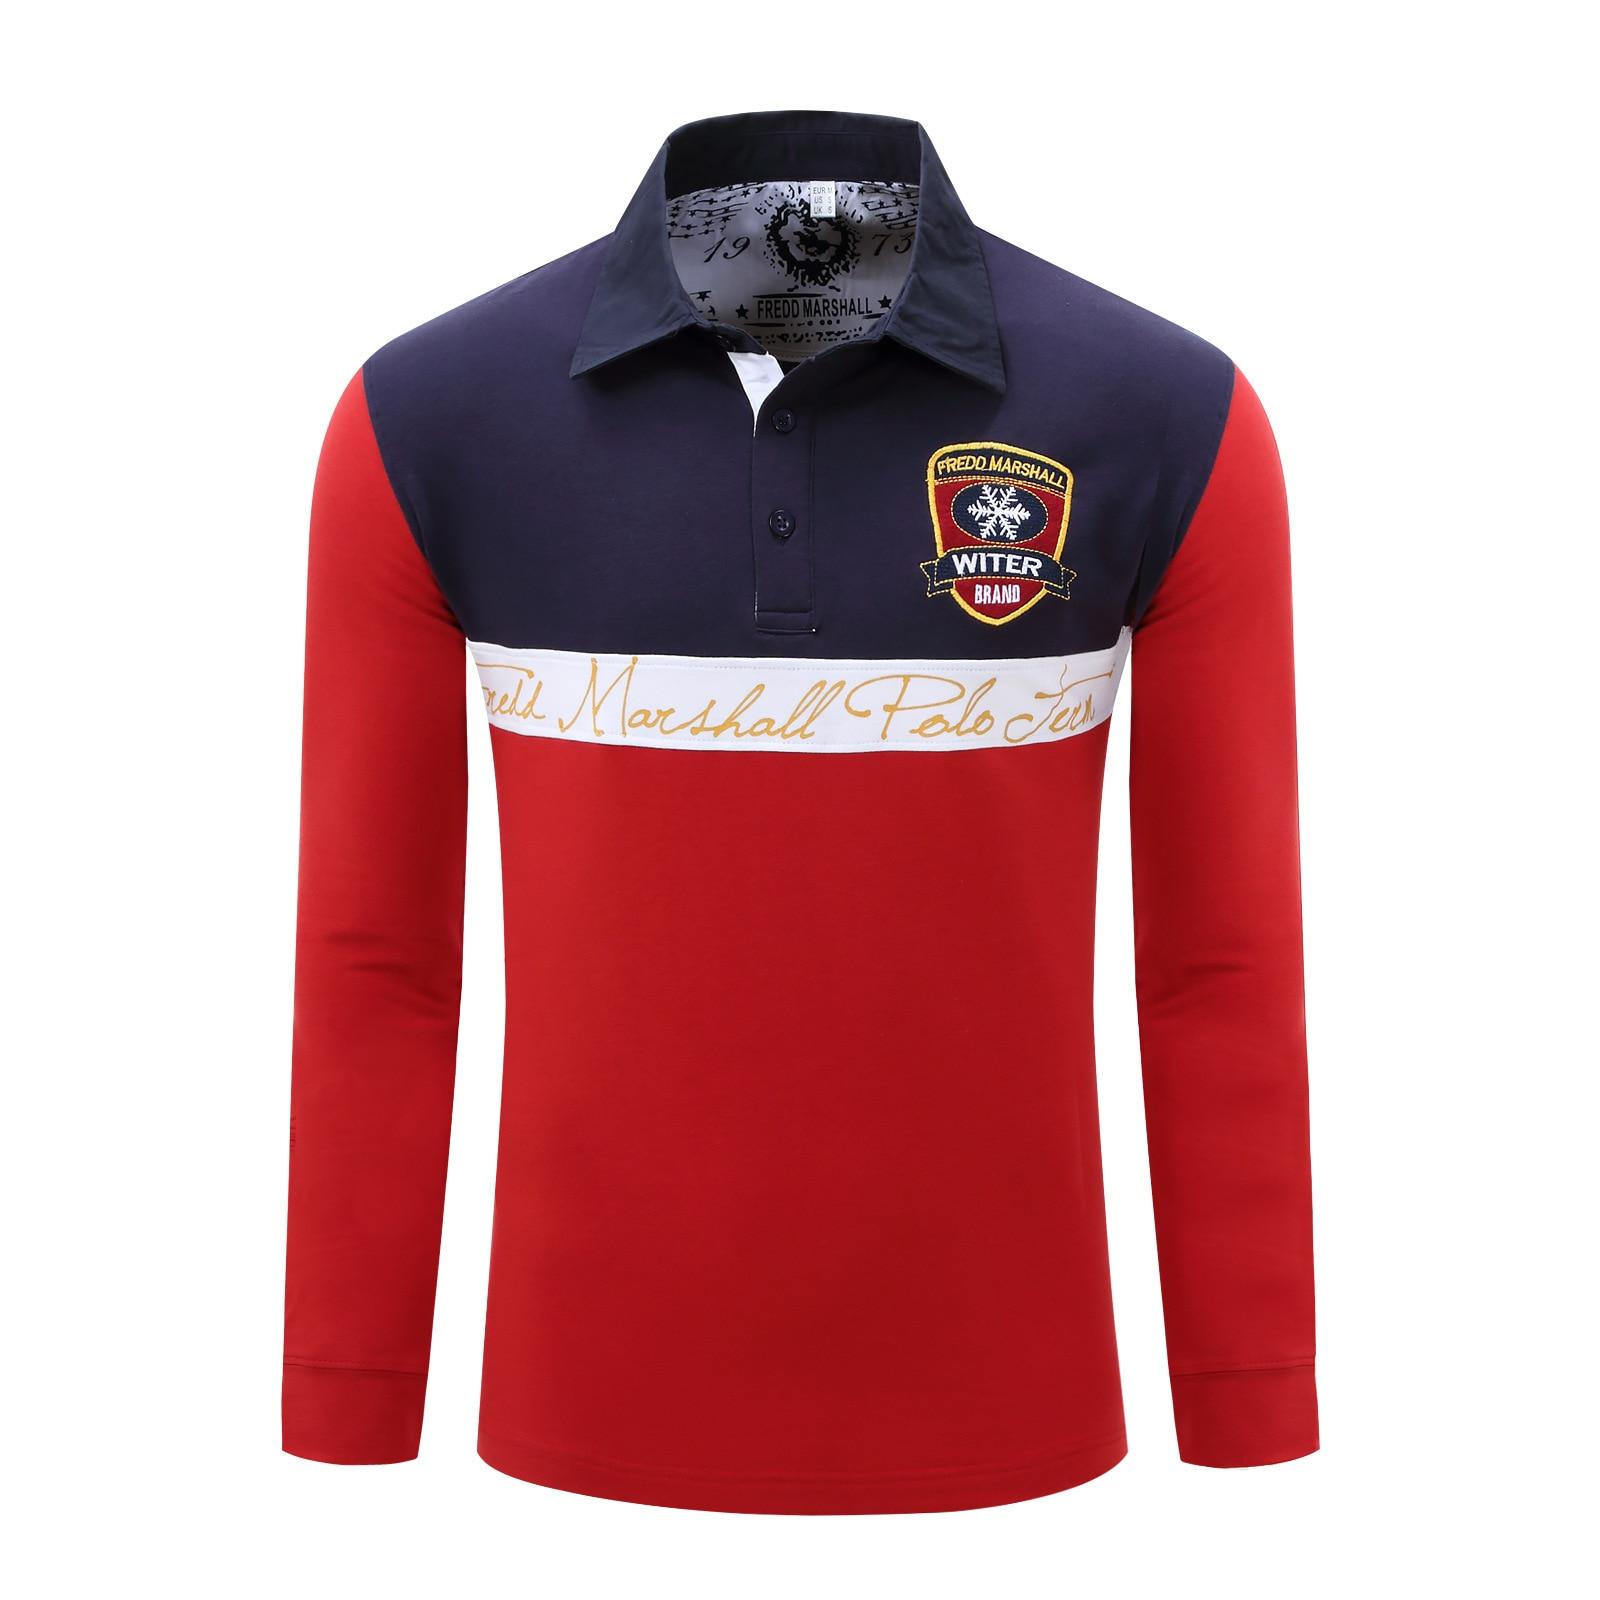 Polo Männer Polo Shirts Fredd Marshall Langarm Feste Beiläufige Polo Shirts Camisa Polos Rot Blau Grau Grün Fashion 053 Bequem Und Einfach Zu Tragen Oberteile Und T-shirts